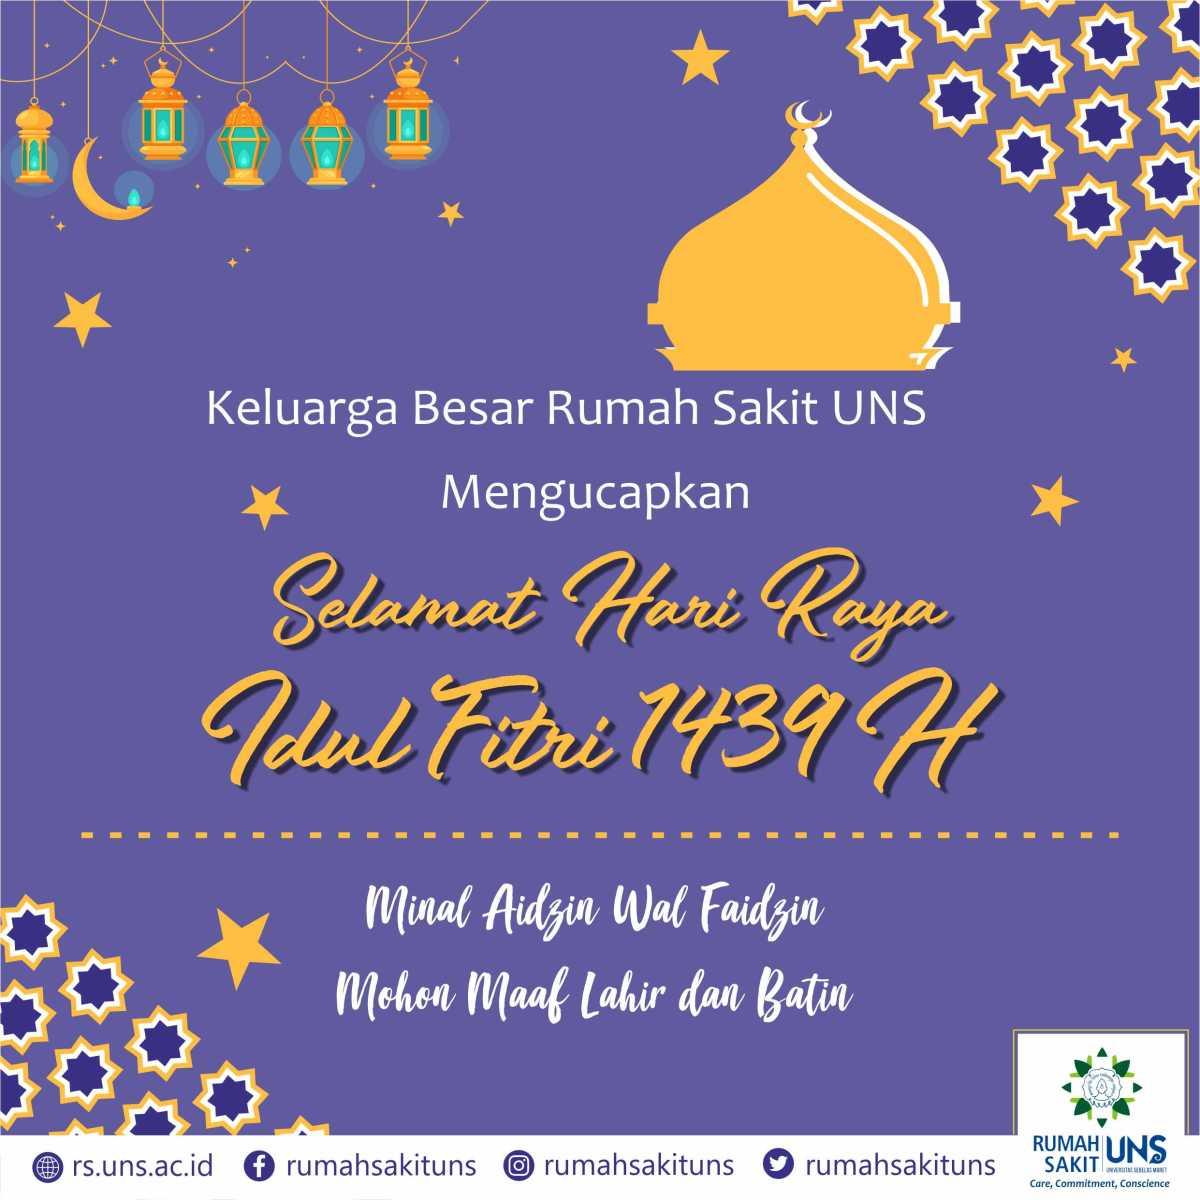 Pelayanan Rumah Sakit Uns Masa Liburan Dan Cuti Bersama Idul Fitri 1439 H Rumah Sakit Uns